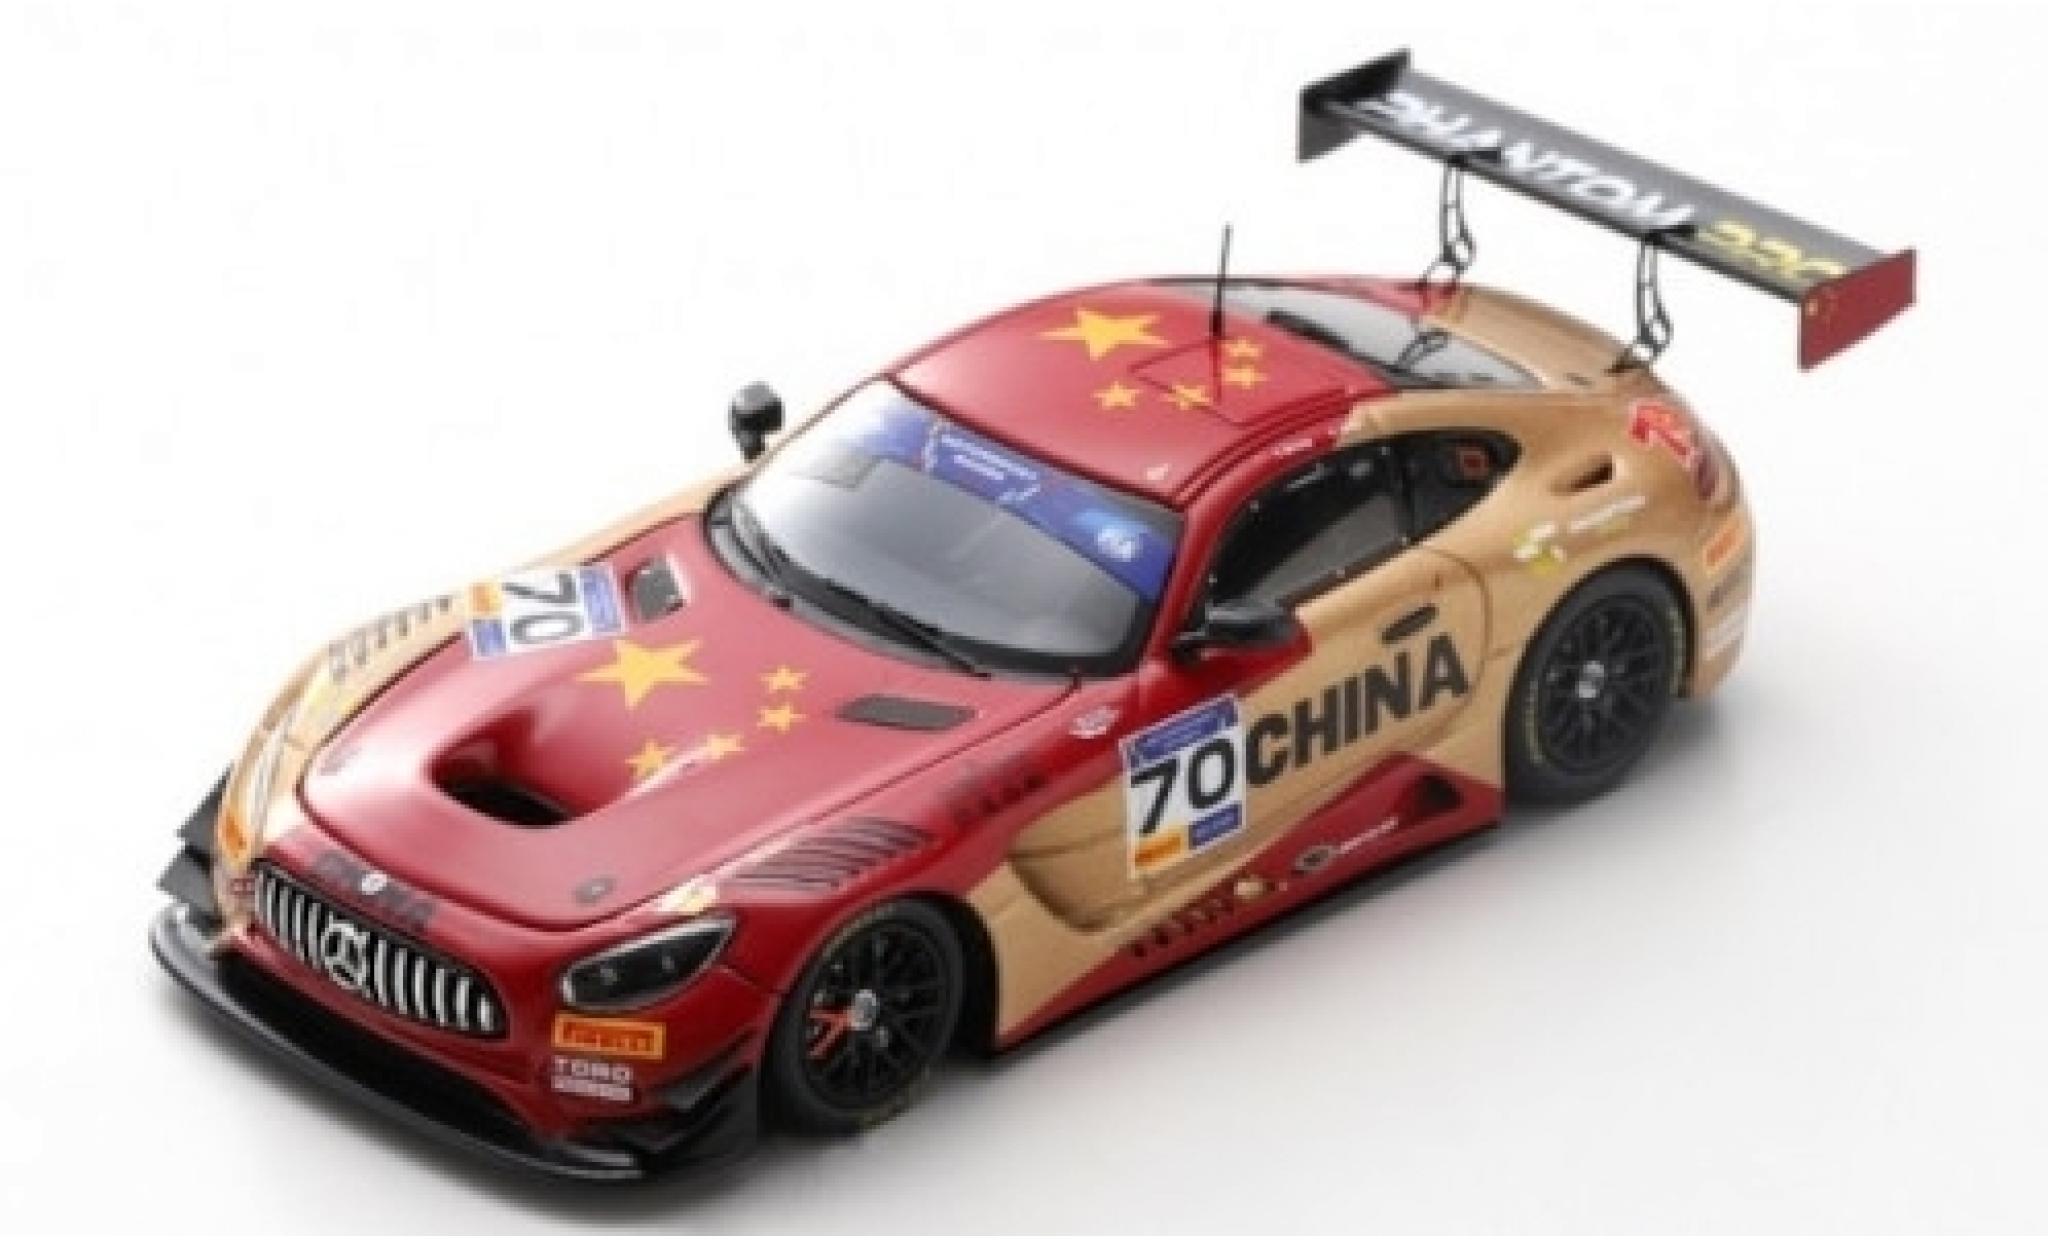 Mercedes AMG GT 1/43 Spark 3 No.70 Phantom Pro FIA Motorsport Games GT Cup Vallelunga 2019 Team China Y.Zhang/K.Zang